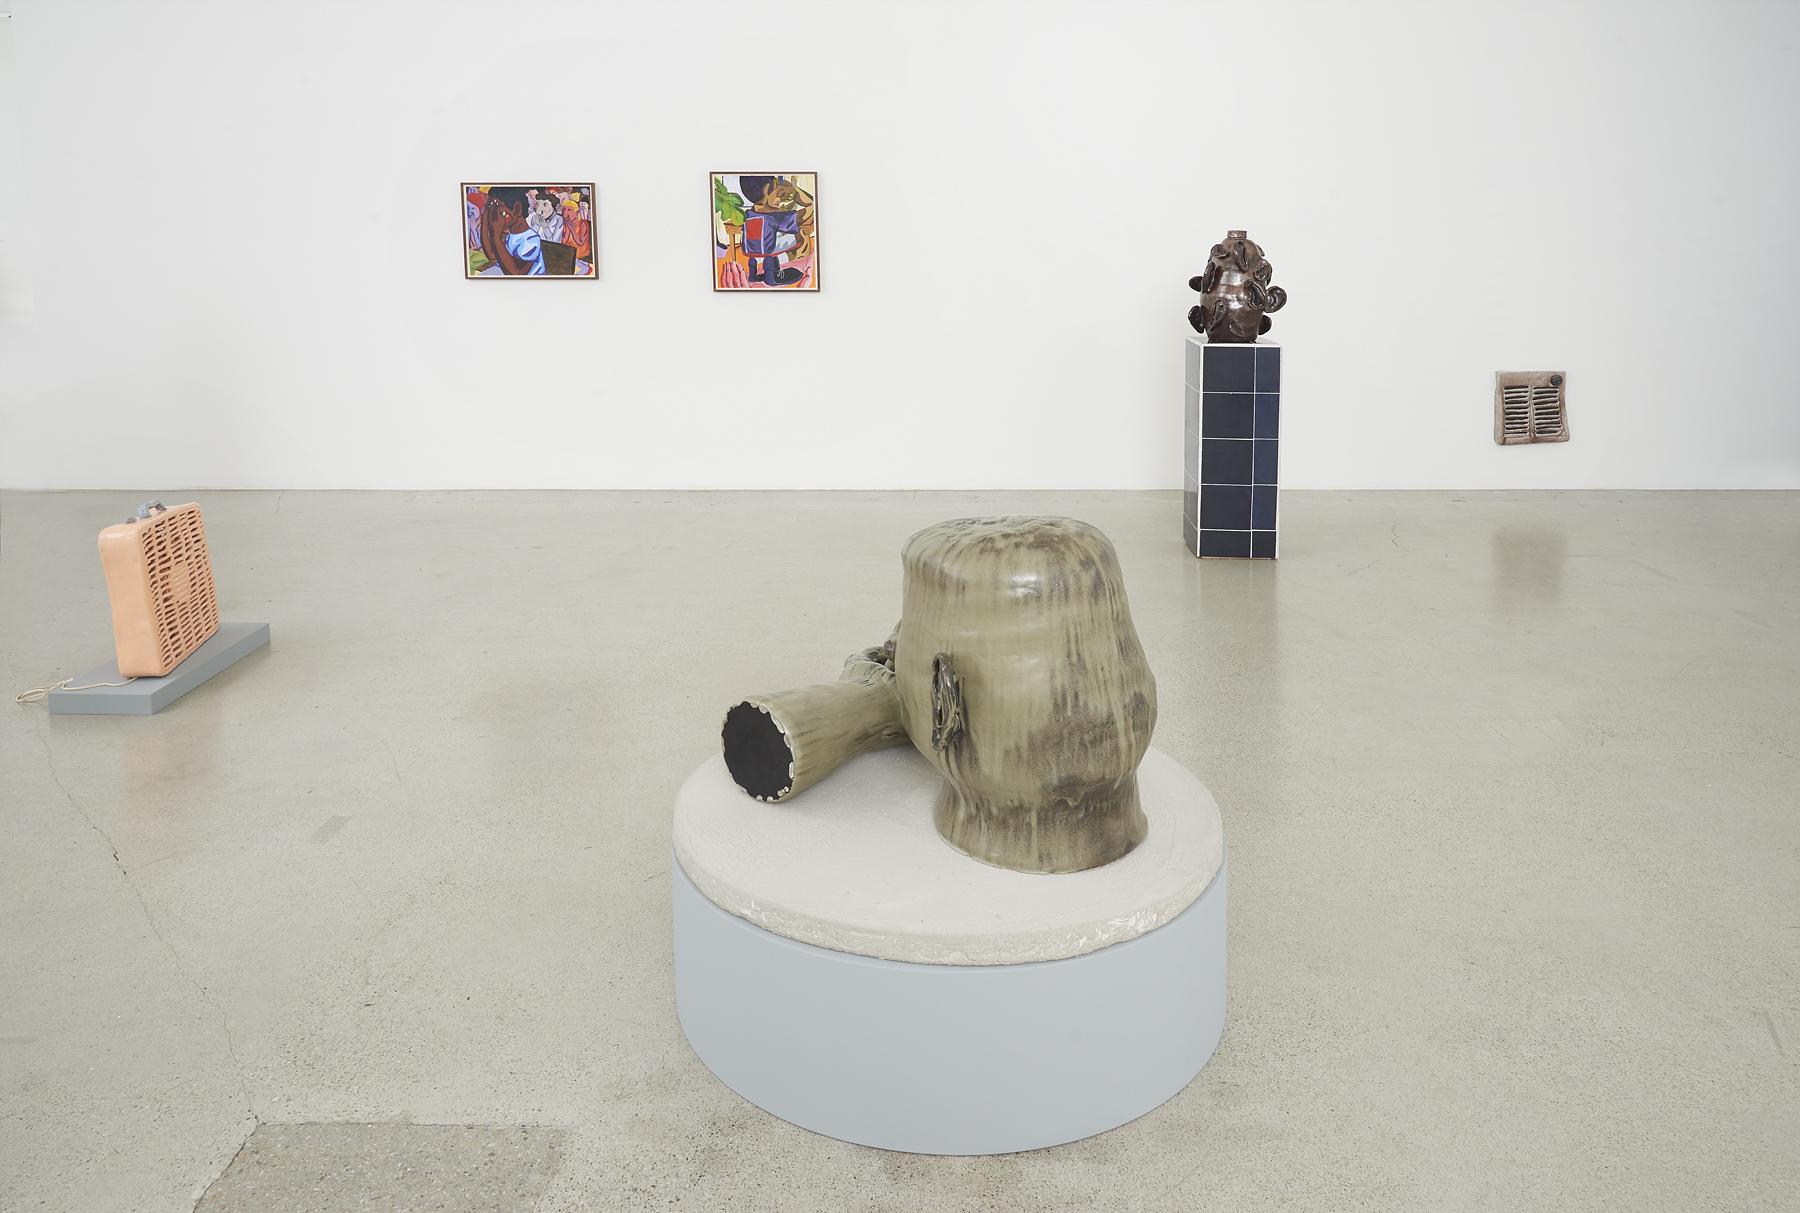 Othello_Living Room, 2018_Jessica Silverman Gallery_Installation view 08.PRS.jpg